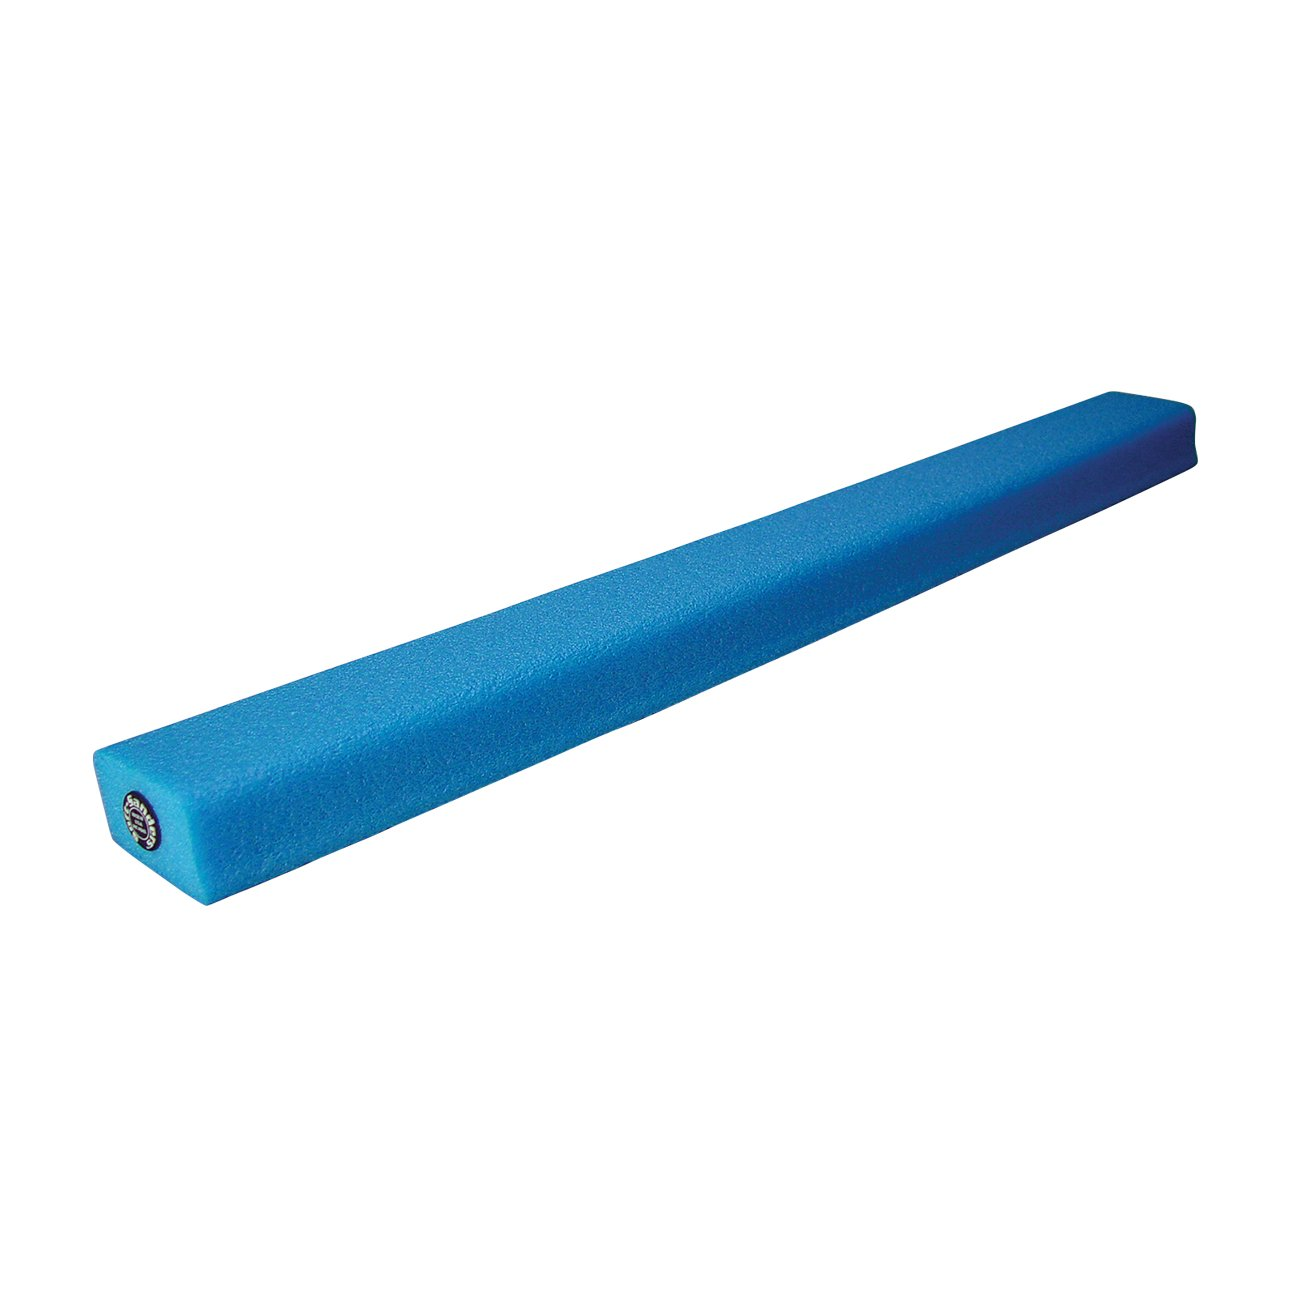 Style-Line 24''L Blue Quad-Radii Soft-Sander 324, Made in USA